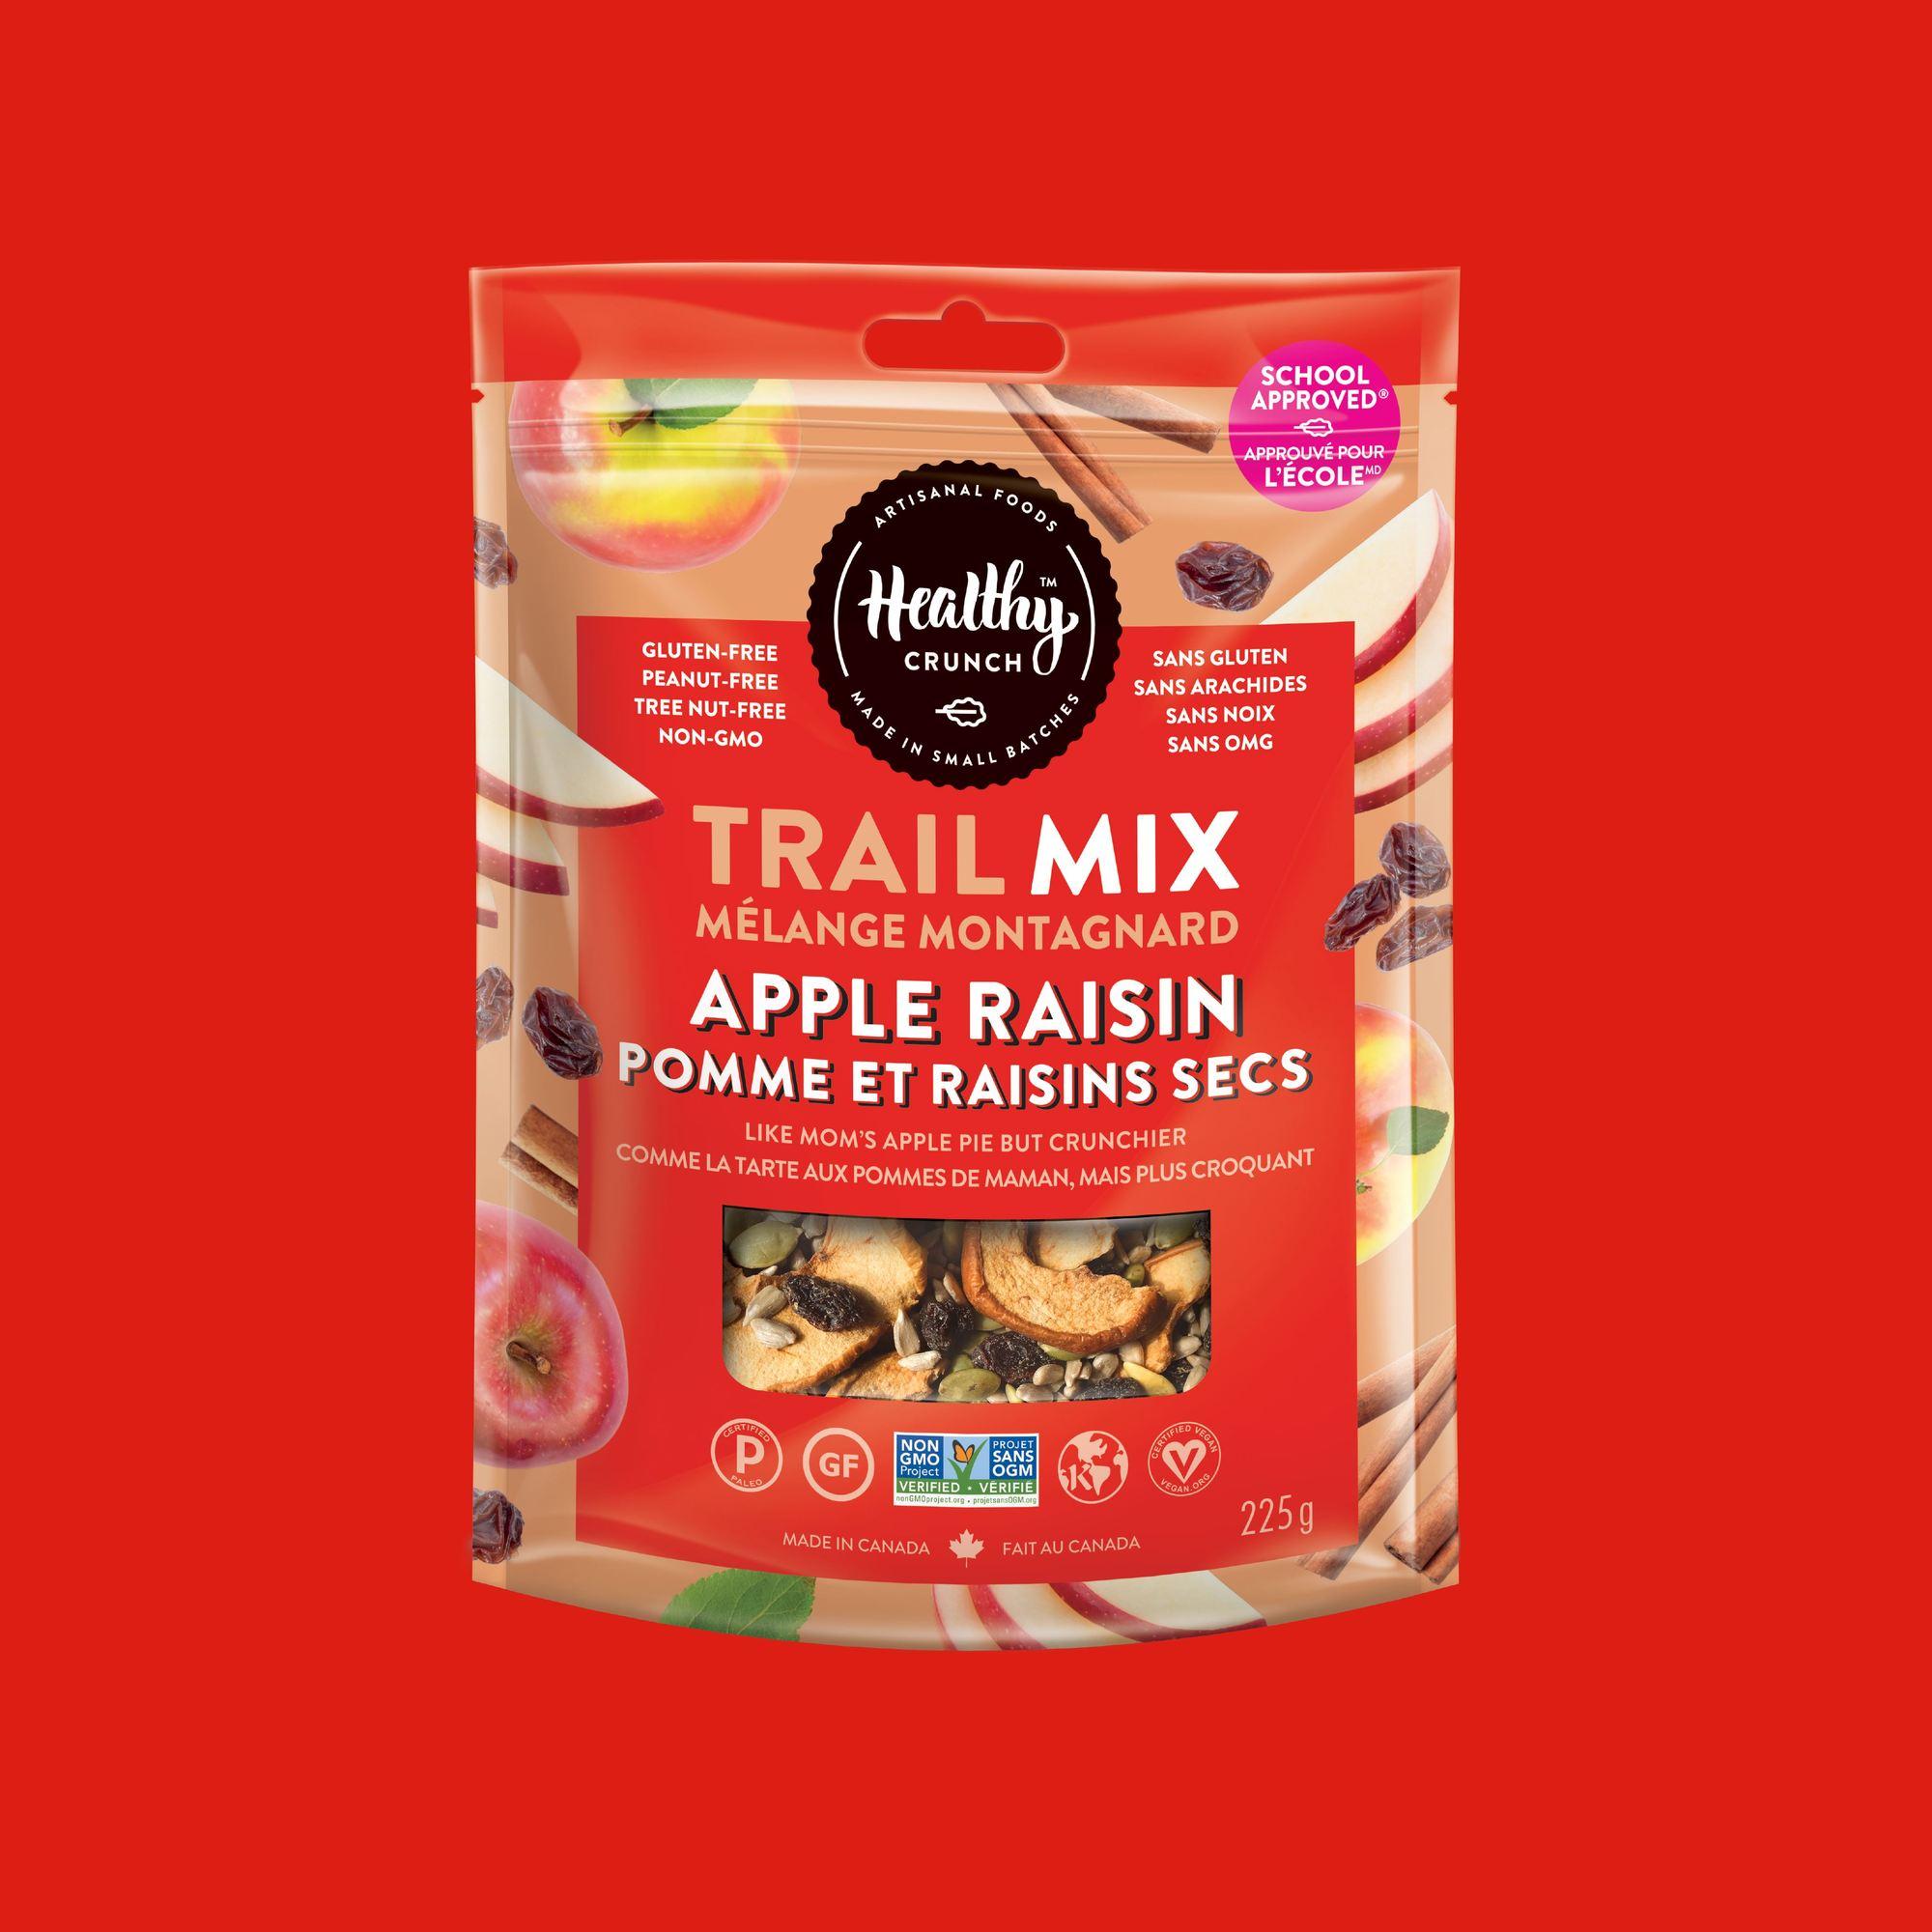 Apple Raisin Trail Mix